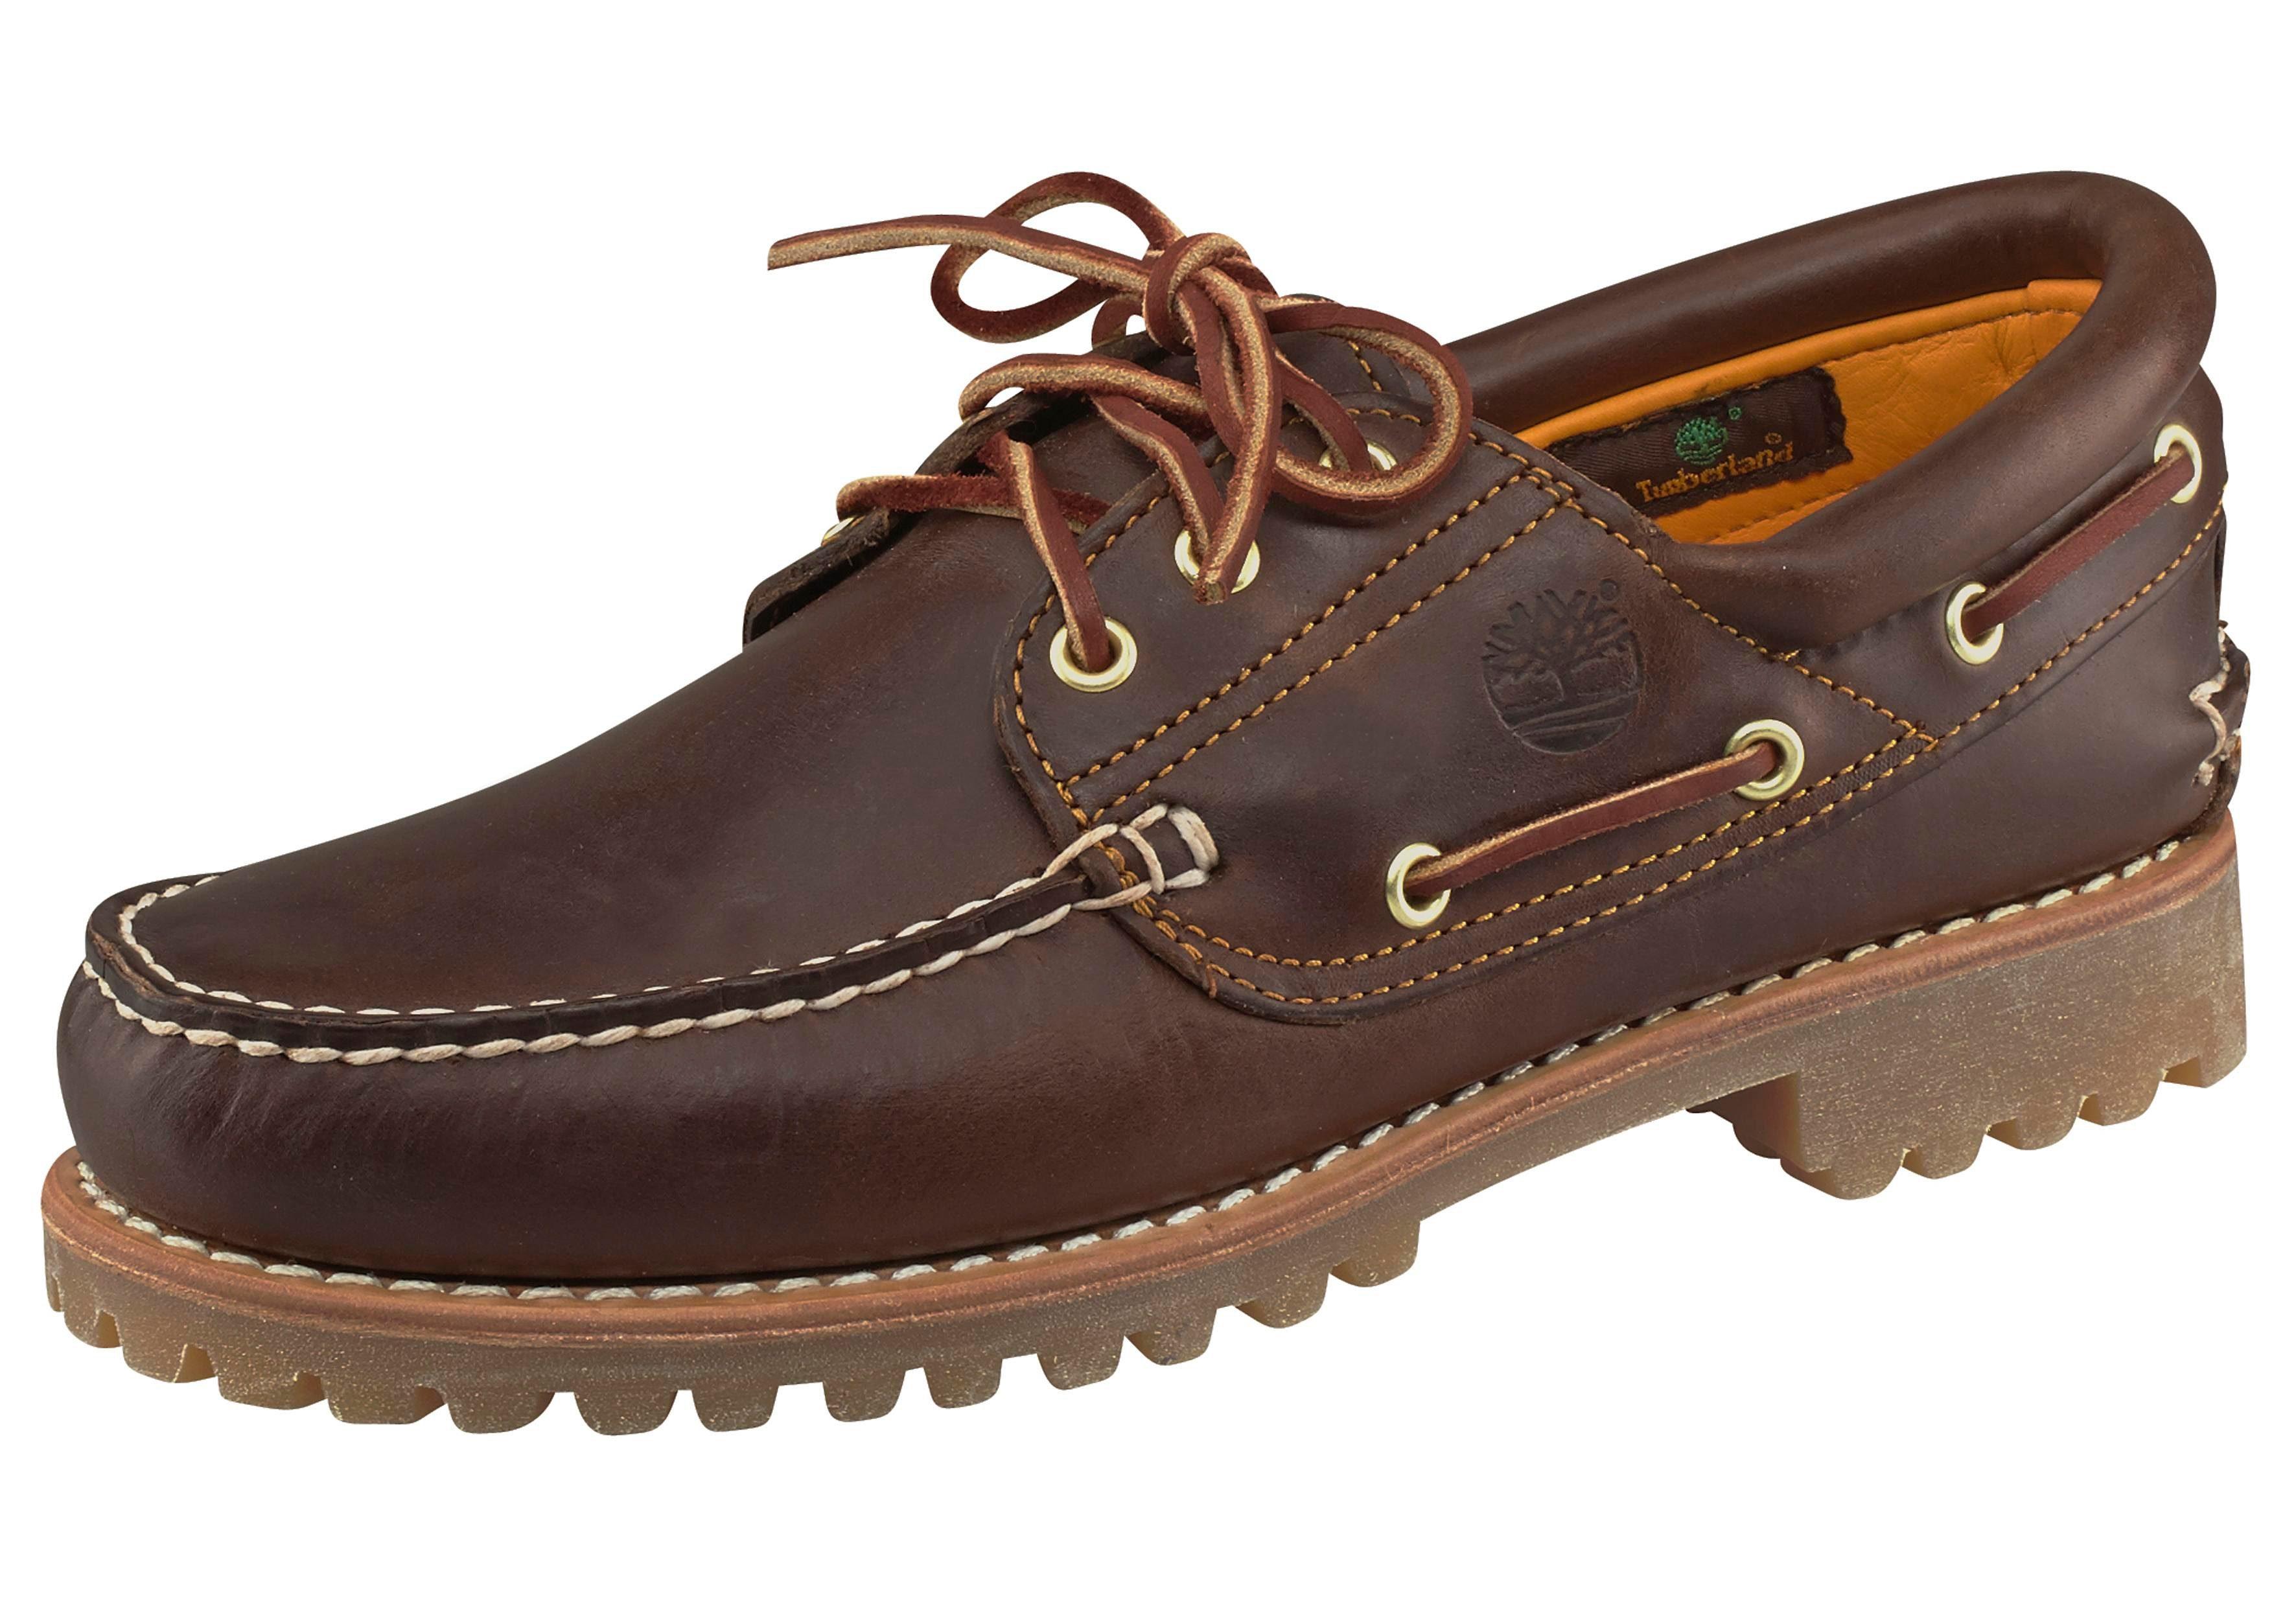 Timberland »3 Eye Classic Lug« Bootsschuh kaufen | OTTO